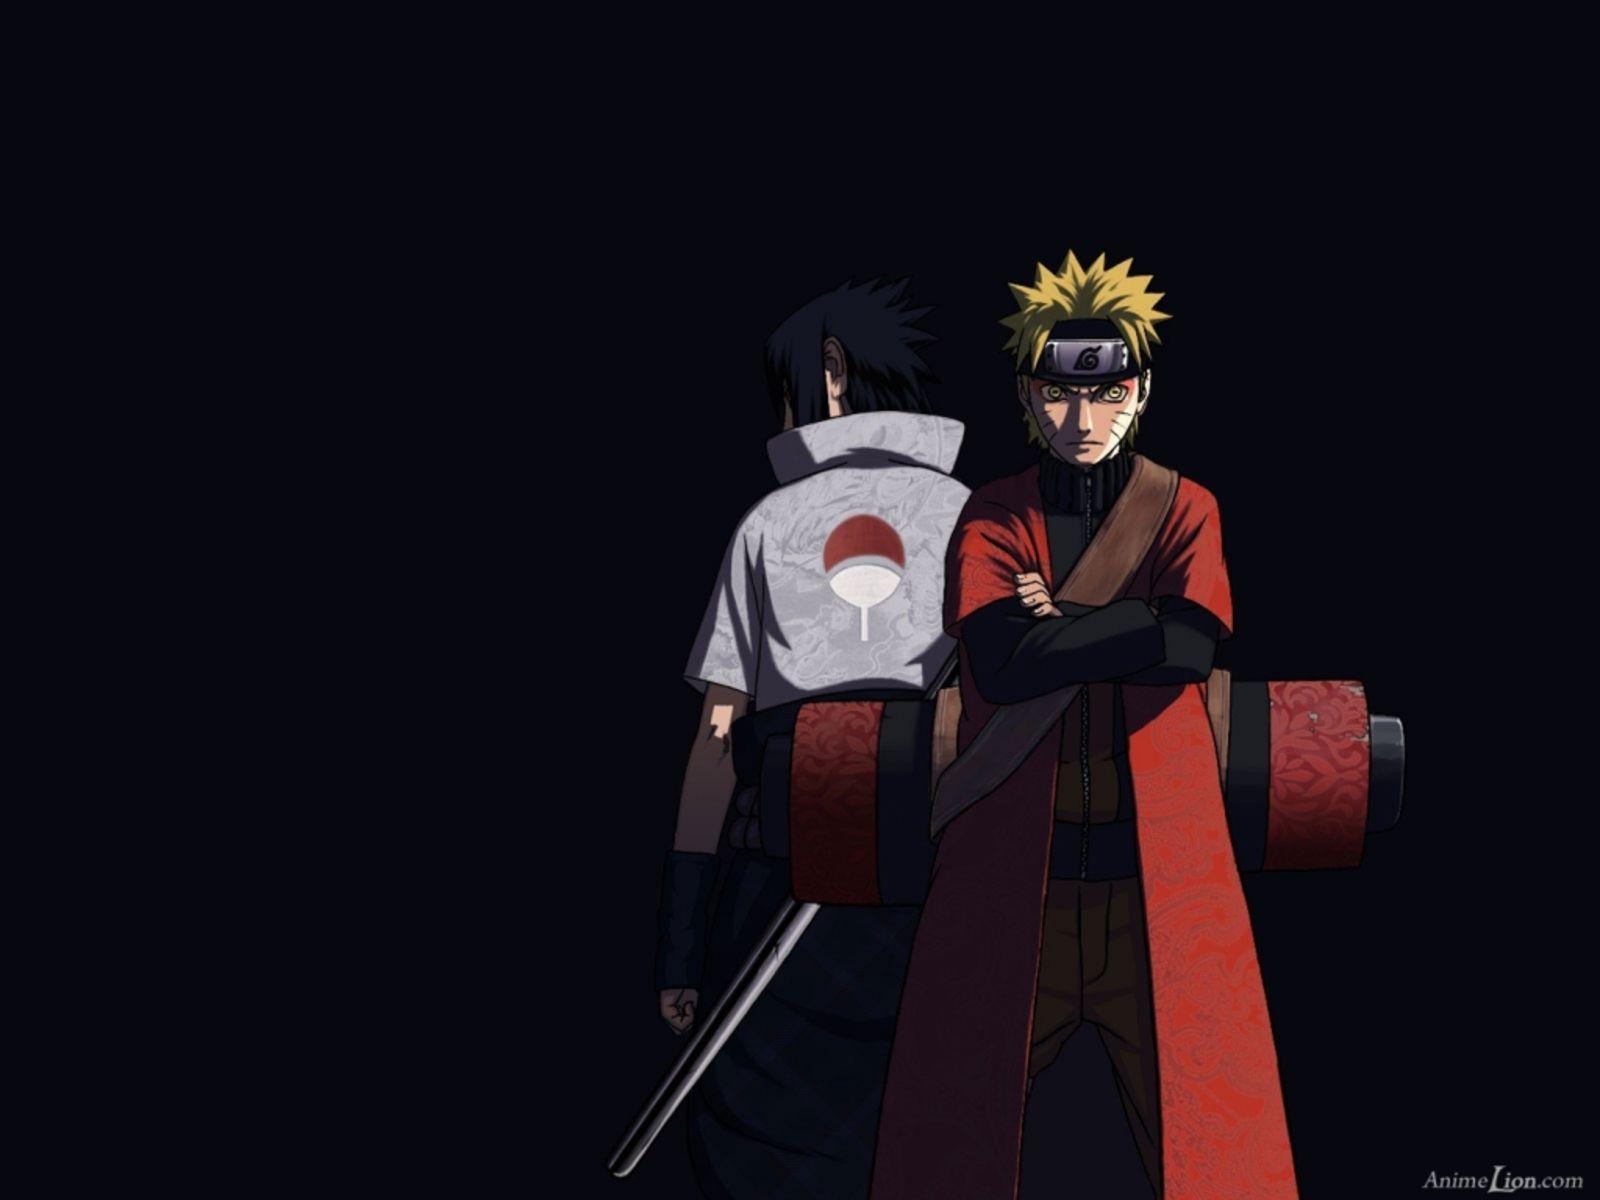 Cool Wallpaper Naruto Anime - b41929f3cdf22b338404aae30fdfdf9a  Perfect Image Reference_689557.jpg